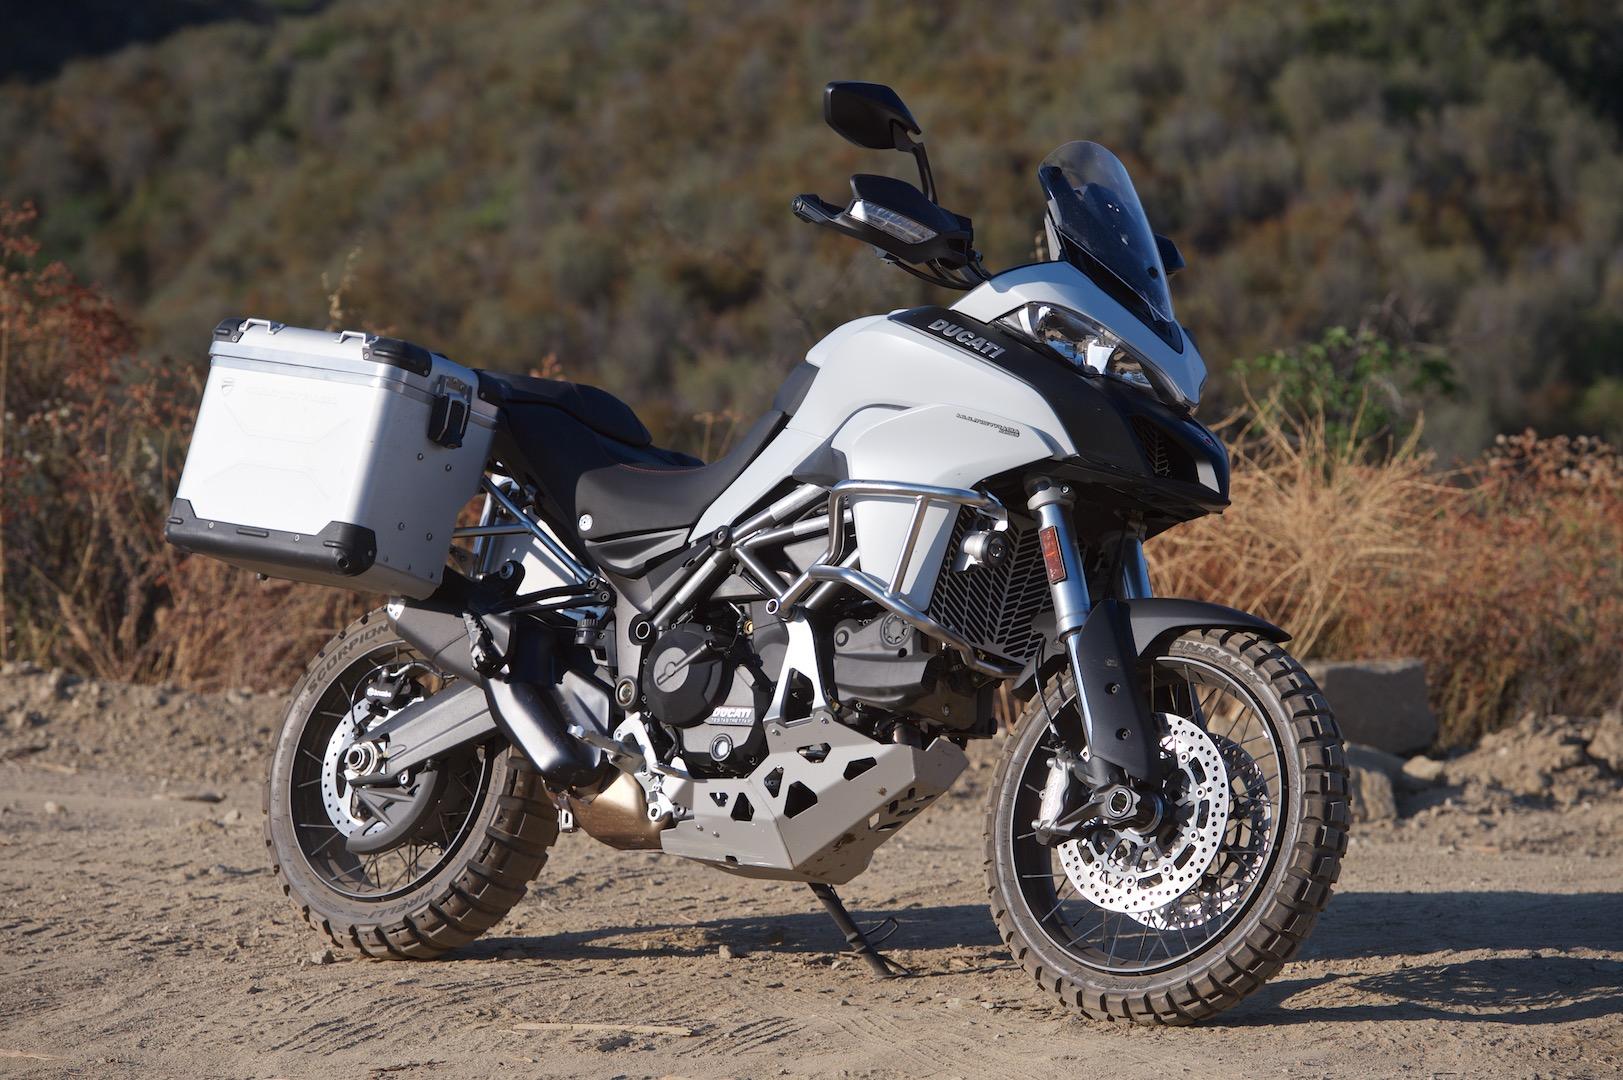 2017-Ducati-Multistrada-950-Review-ADV-motorcycle-12.jpg